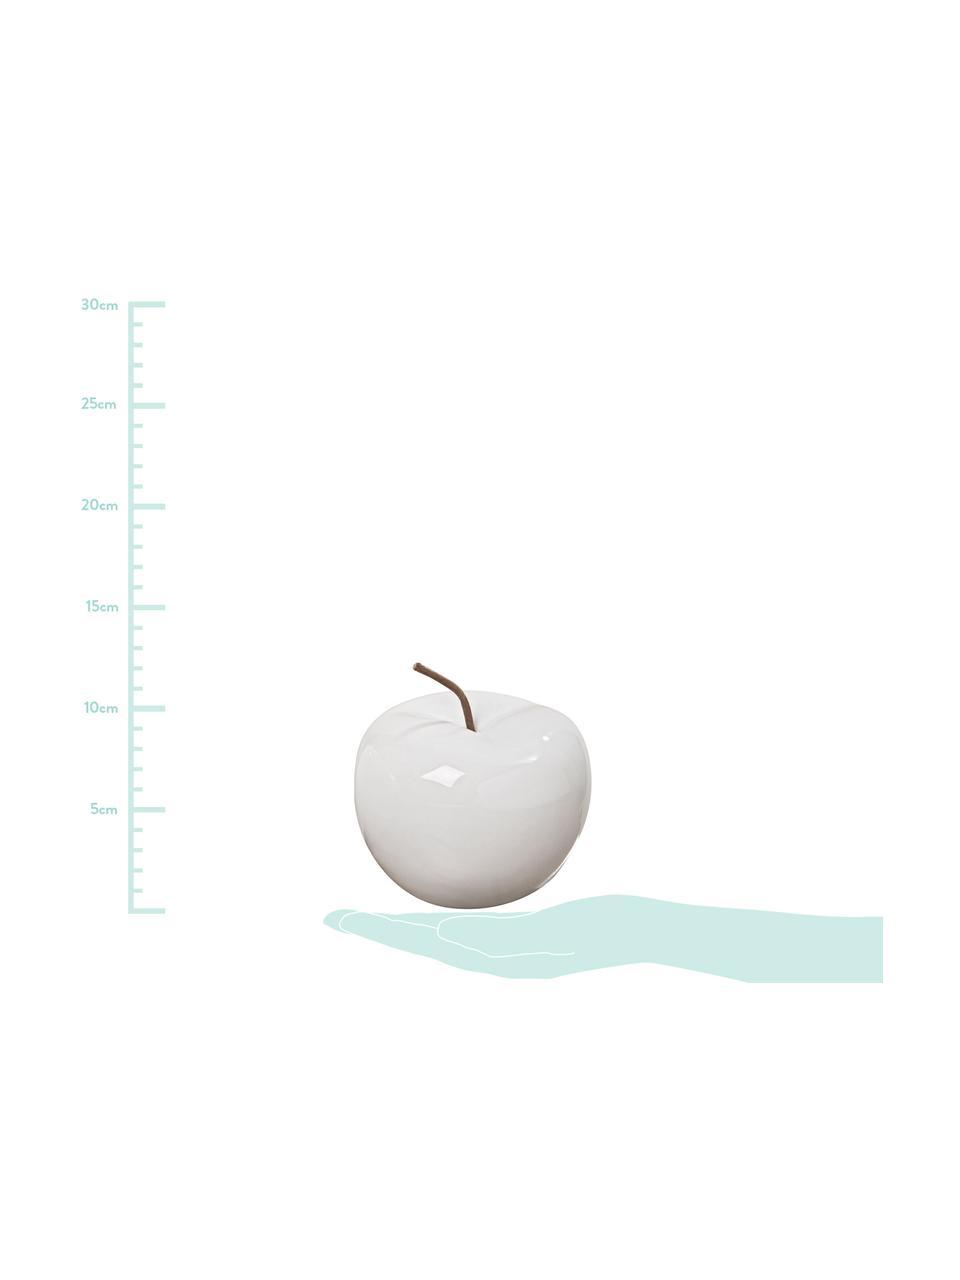 Deko-Äpfel Alvaro, 2 Stück, Steingut, Weiß, Braun, Ø 13 x H 12 cm